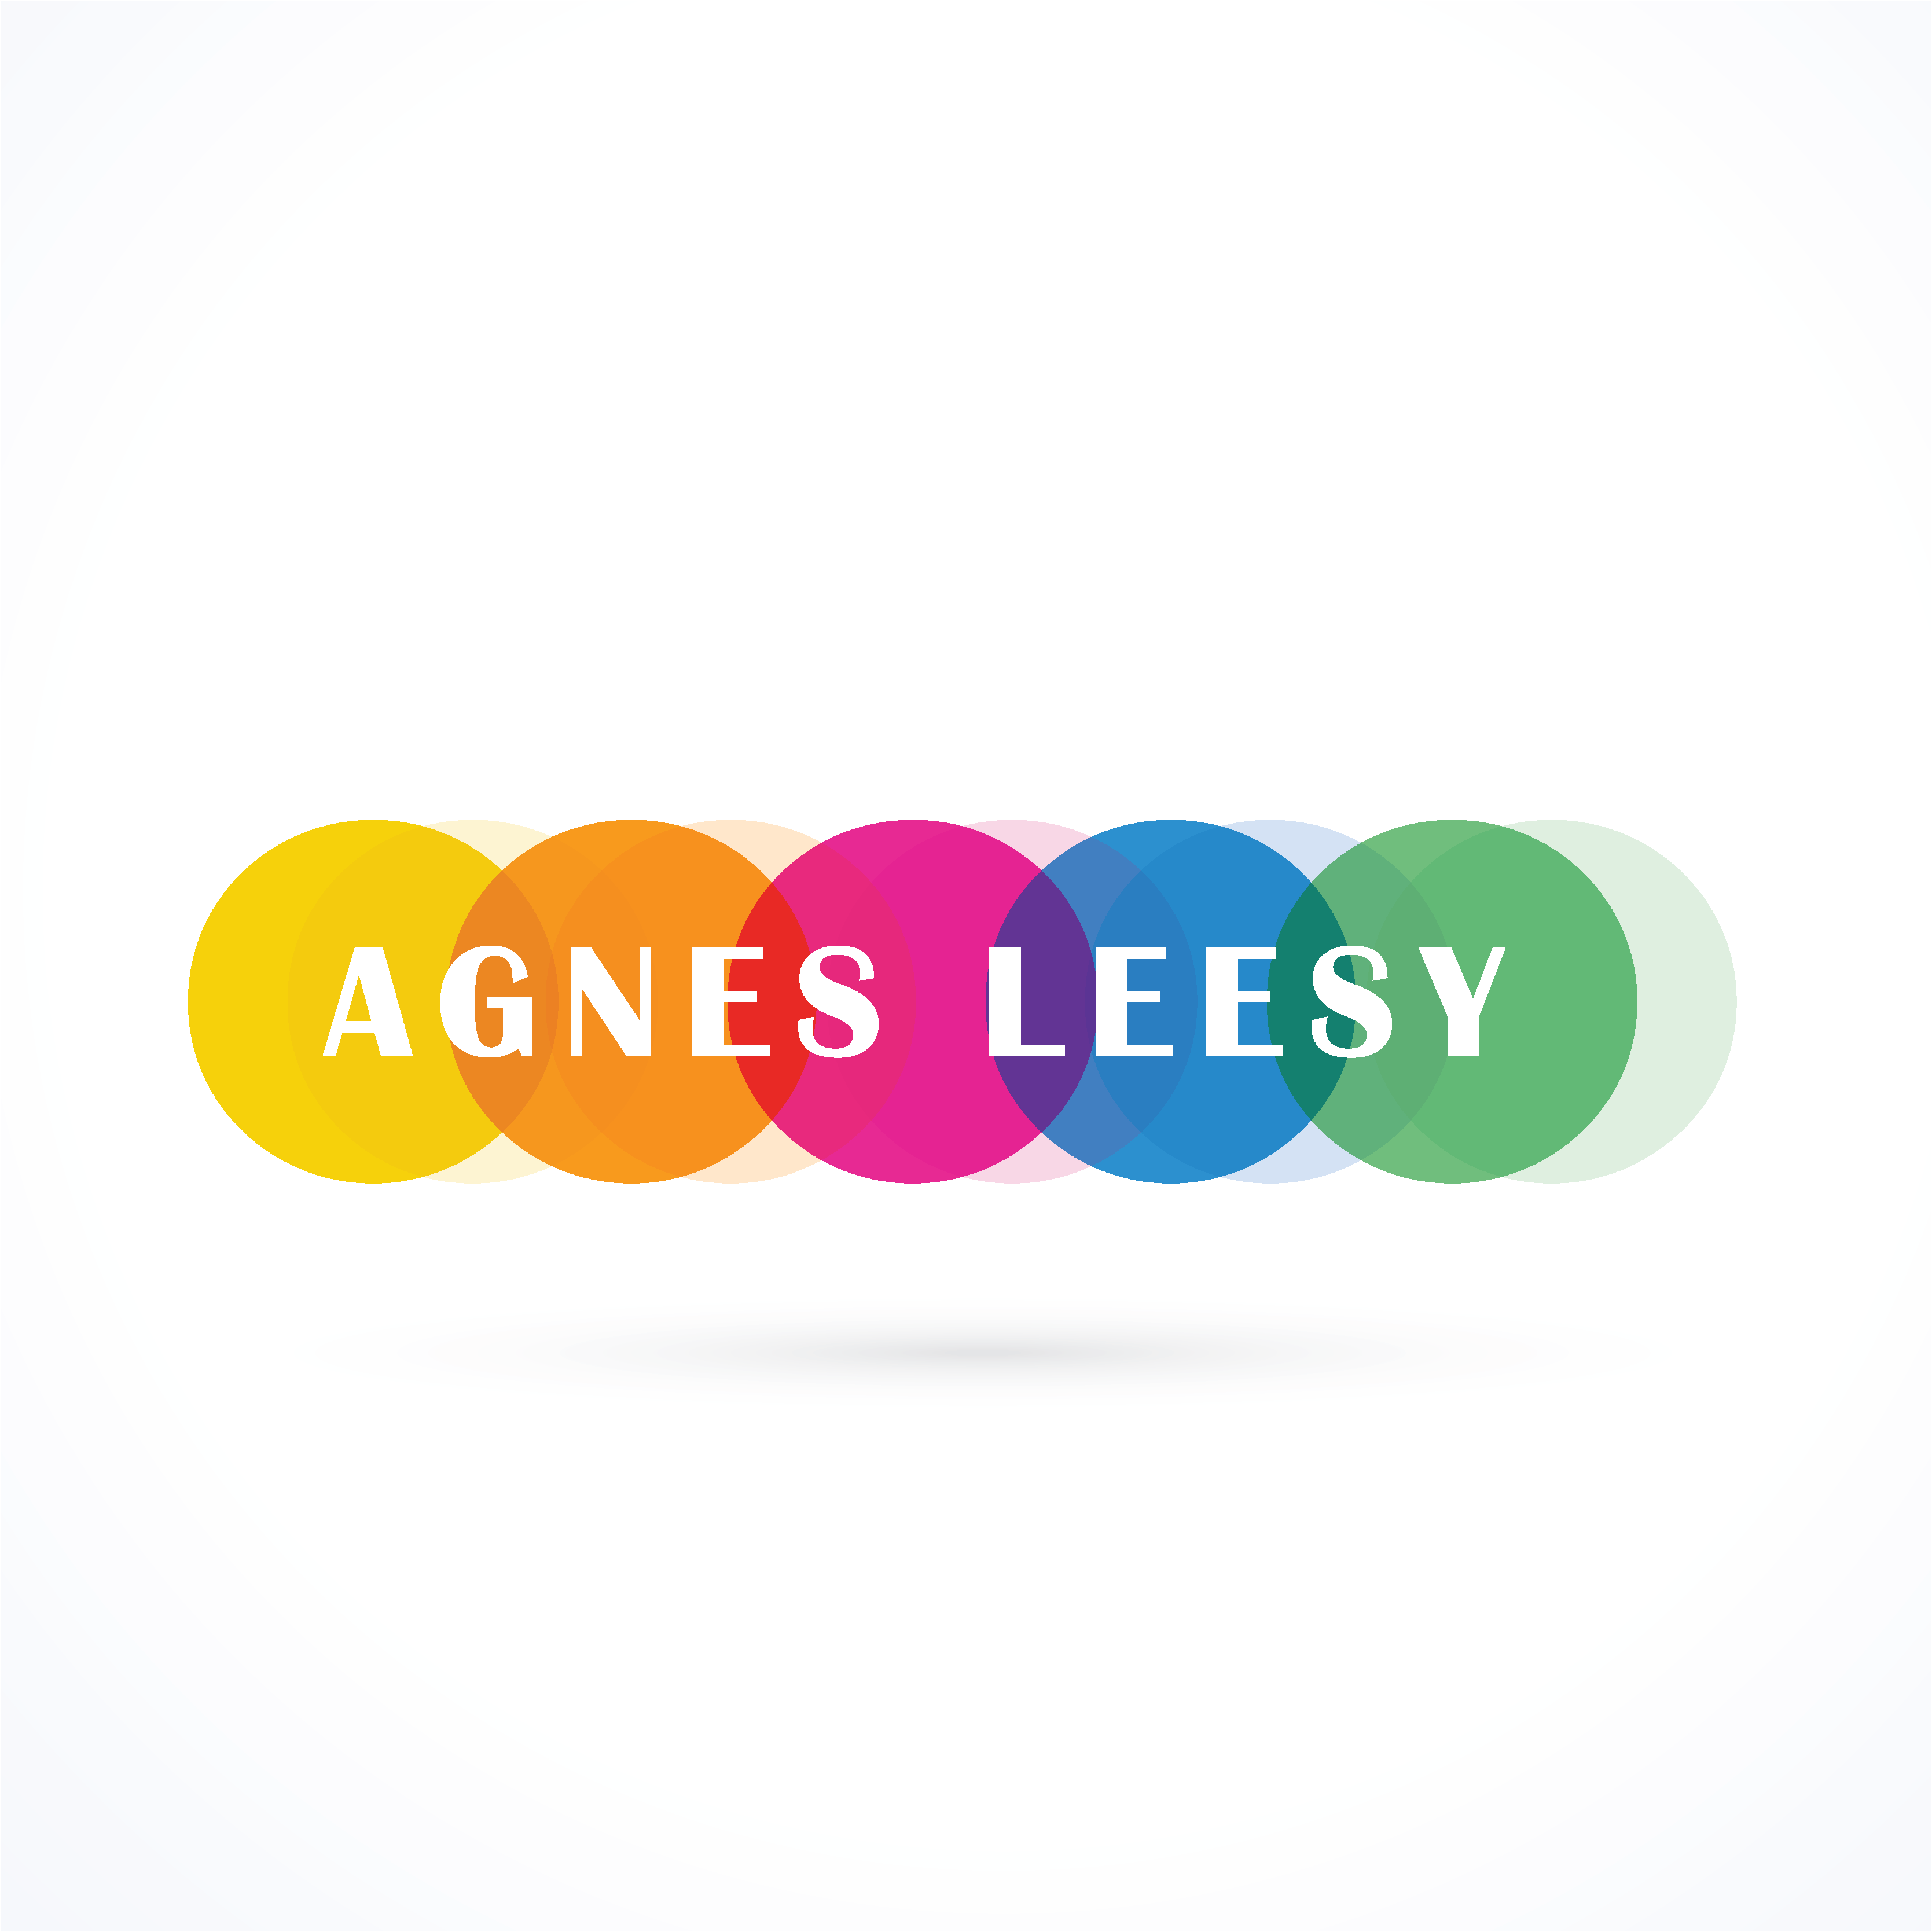 AgnesLeesy LOGO LIFE AIA BERHAD LIFE INSURANCE FINANCIAL ...